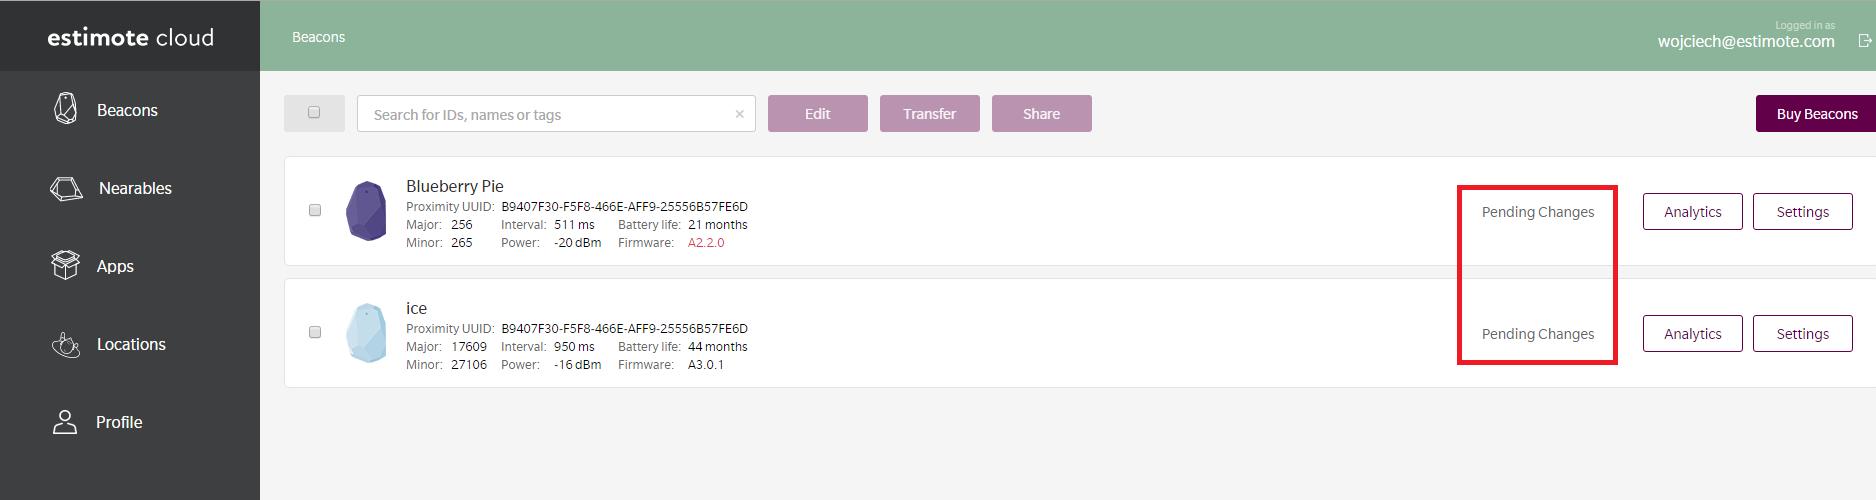 Can I access beacon settings remotely? – Estimote Community Portal